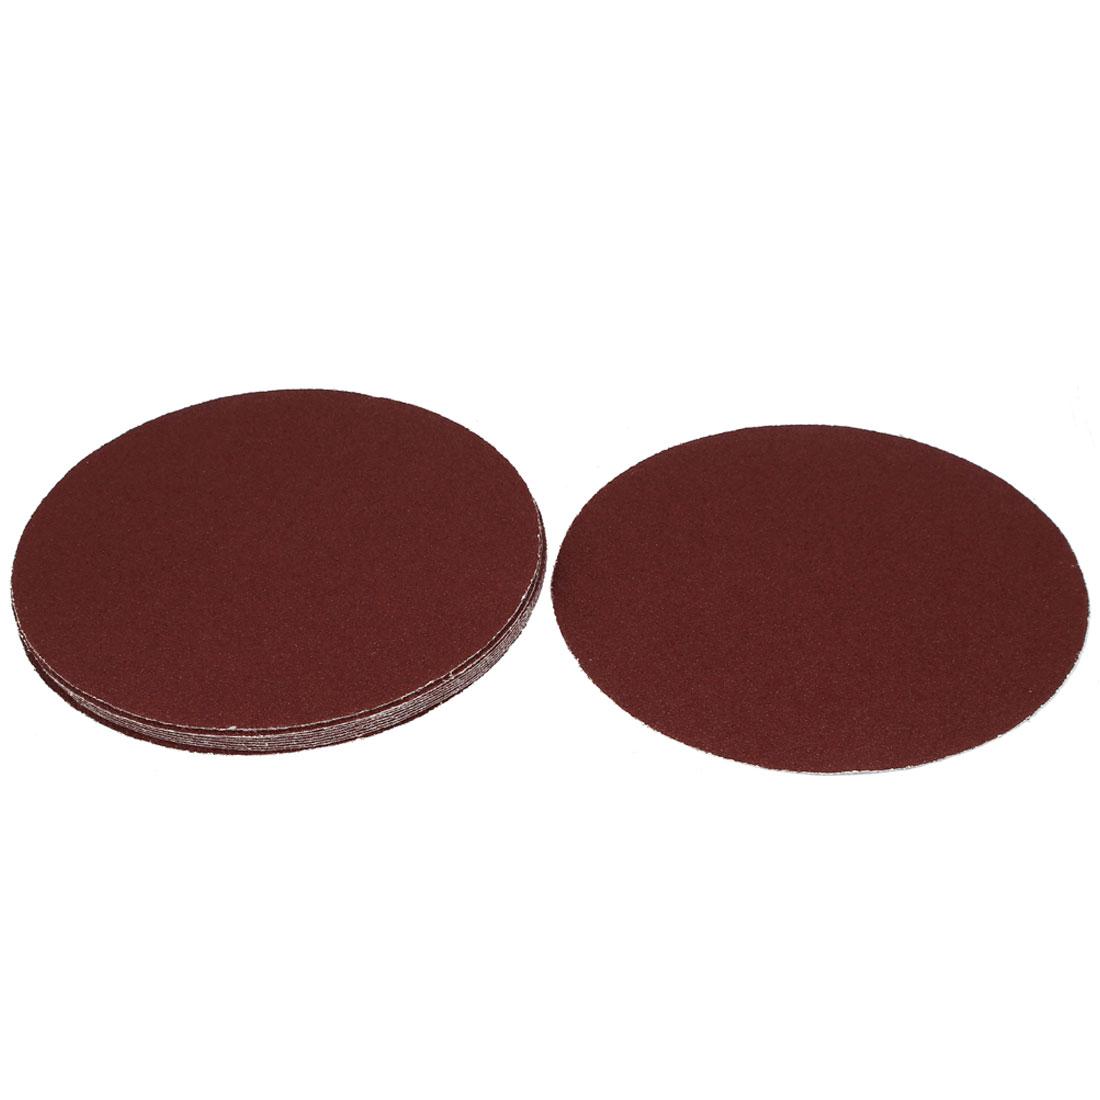 "8"" Dia Polishing Round Abrasive Sanding Sandpaper Sheet Disc 40 Grit 10 Pcs"